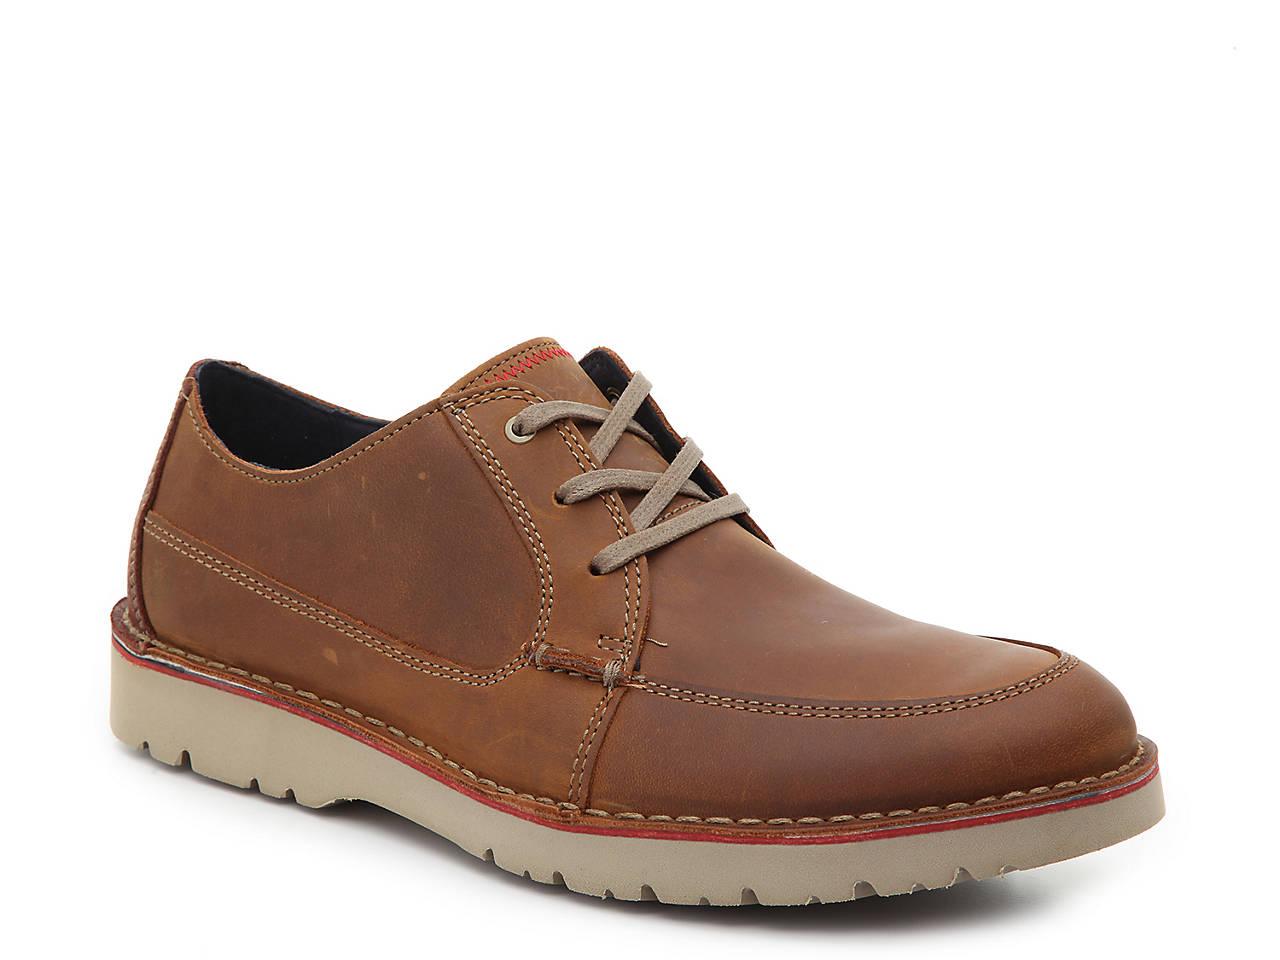 28958ed3354 Clarks Vargo Walk Oxford Men s Shoes